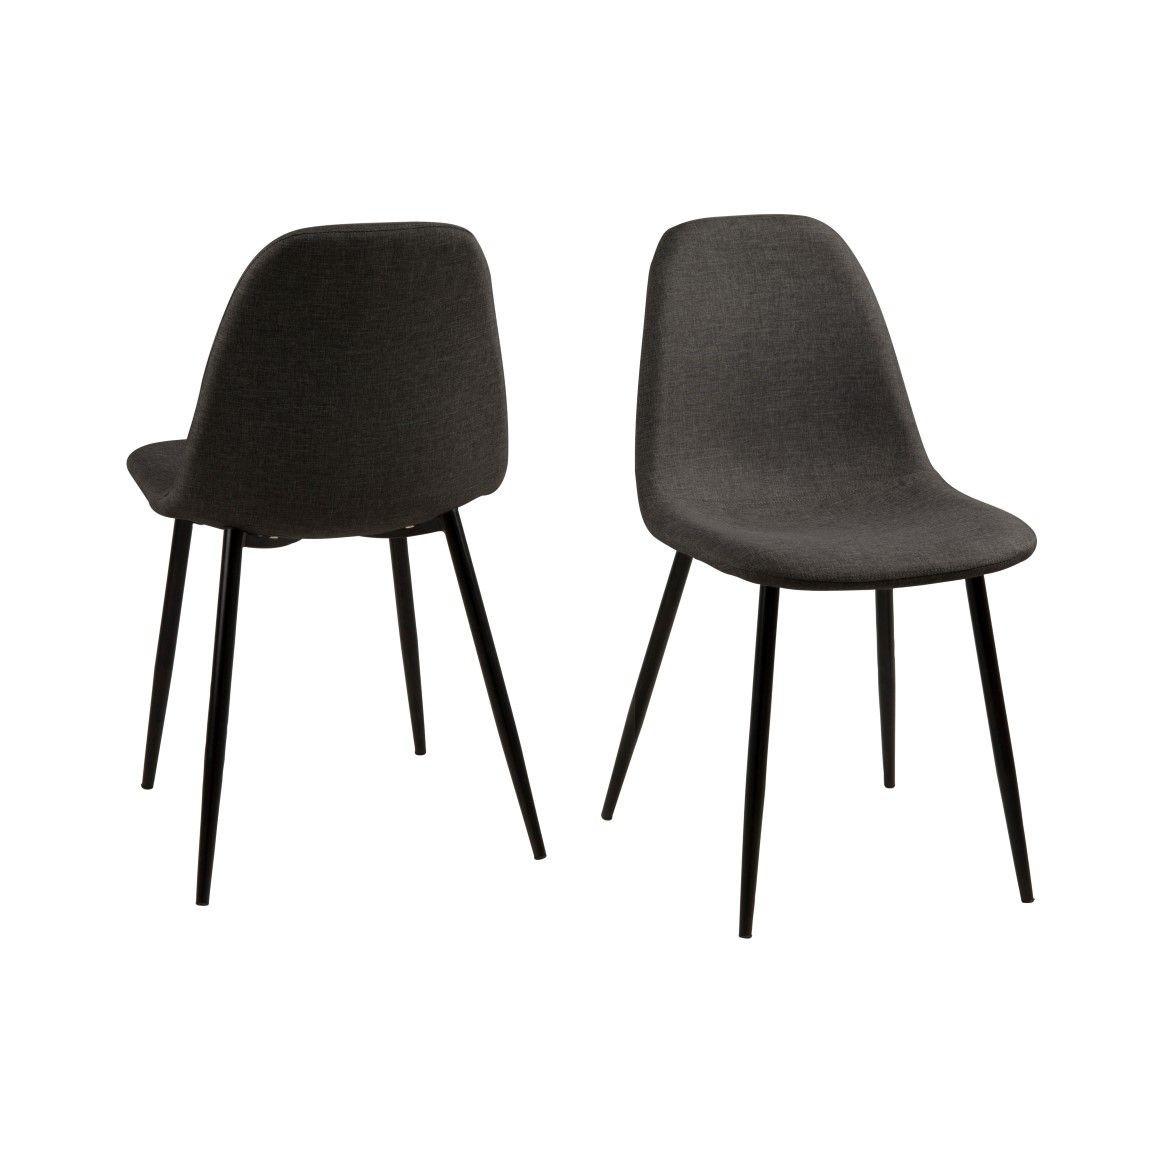 Set of 4 Chairs Wendy   Grey/Black